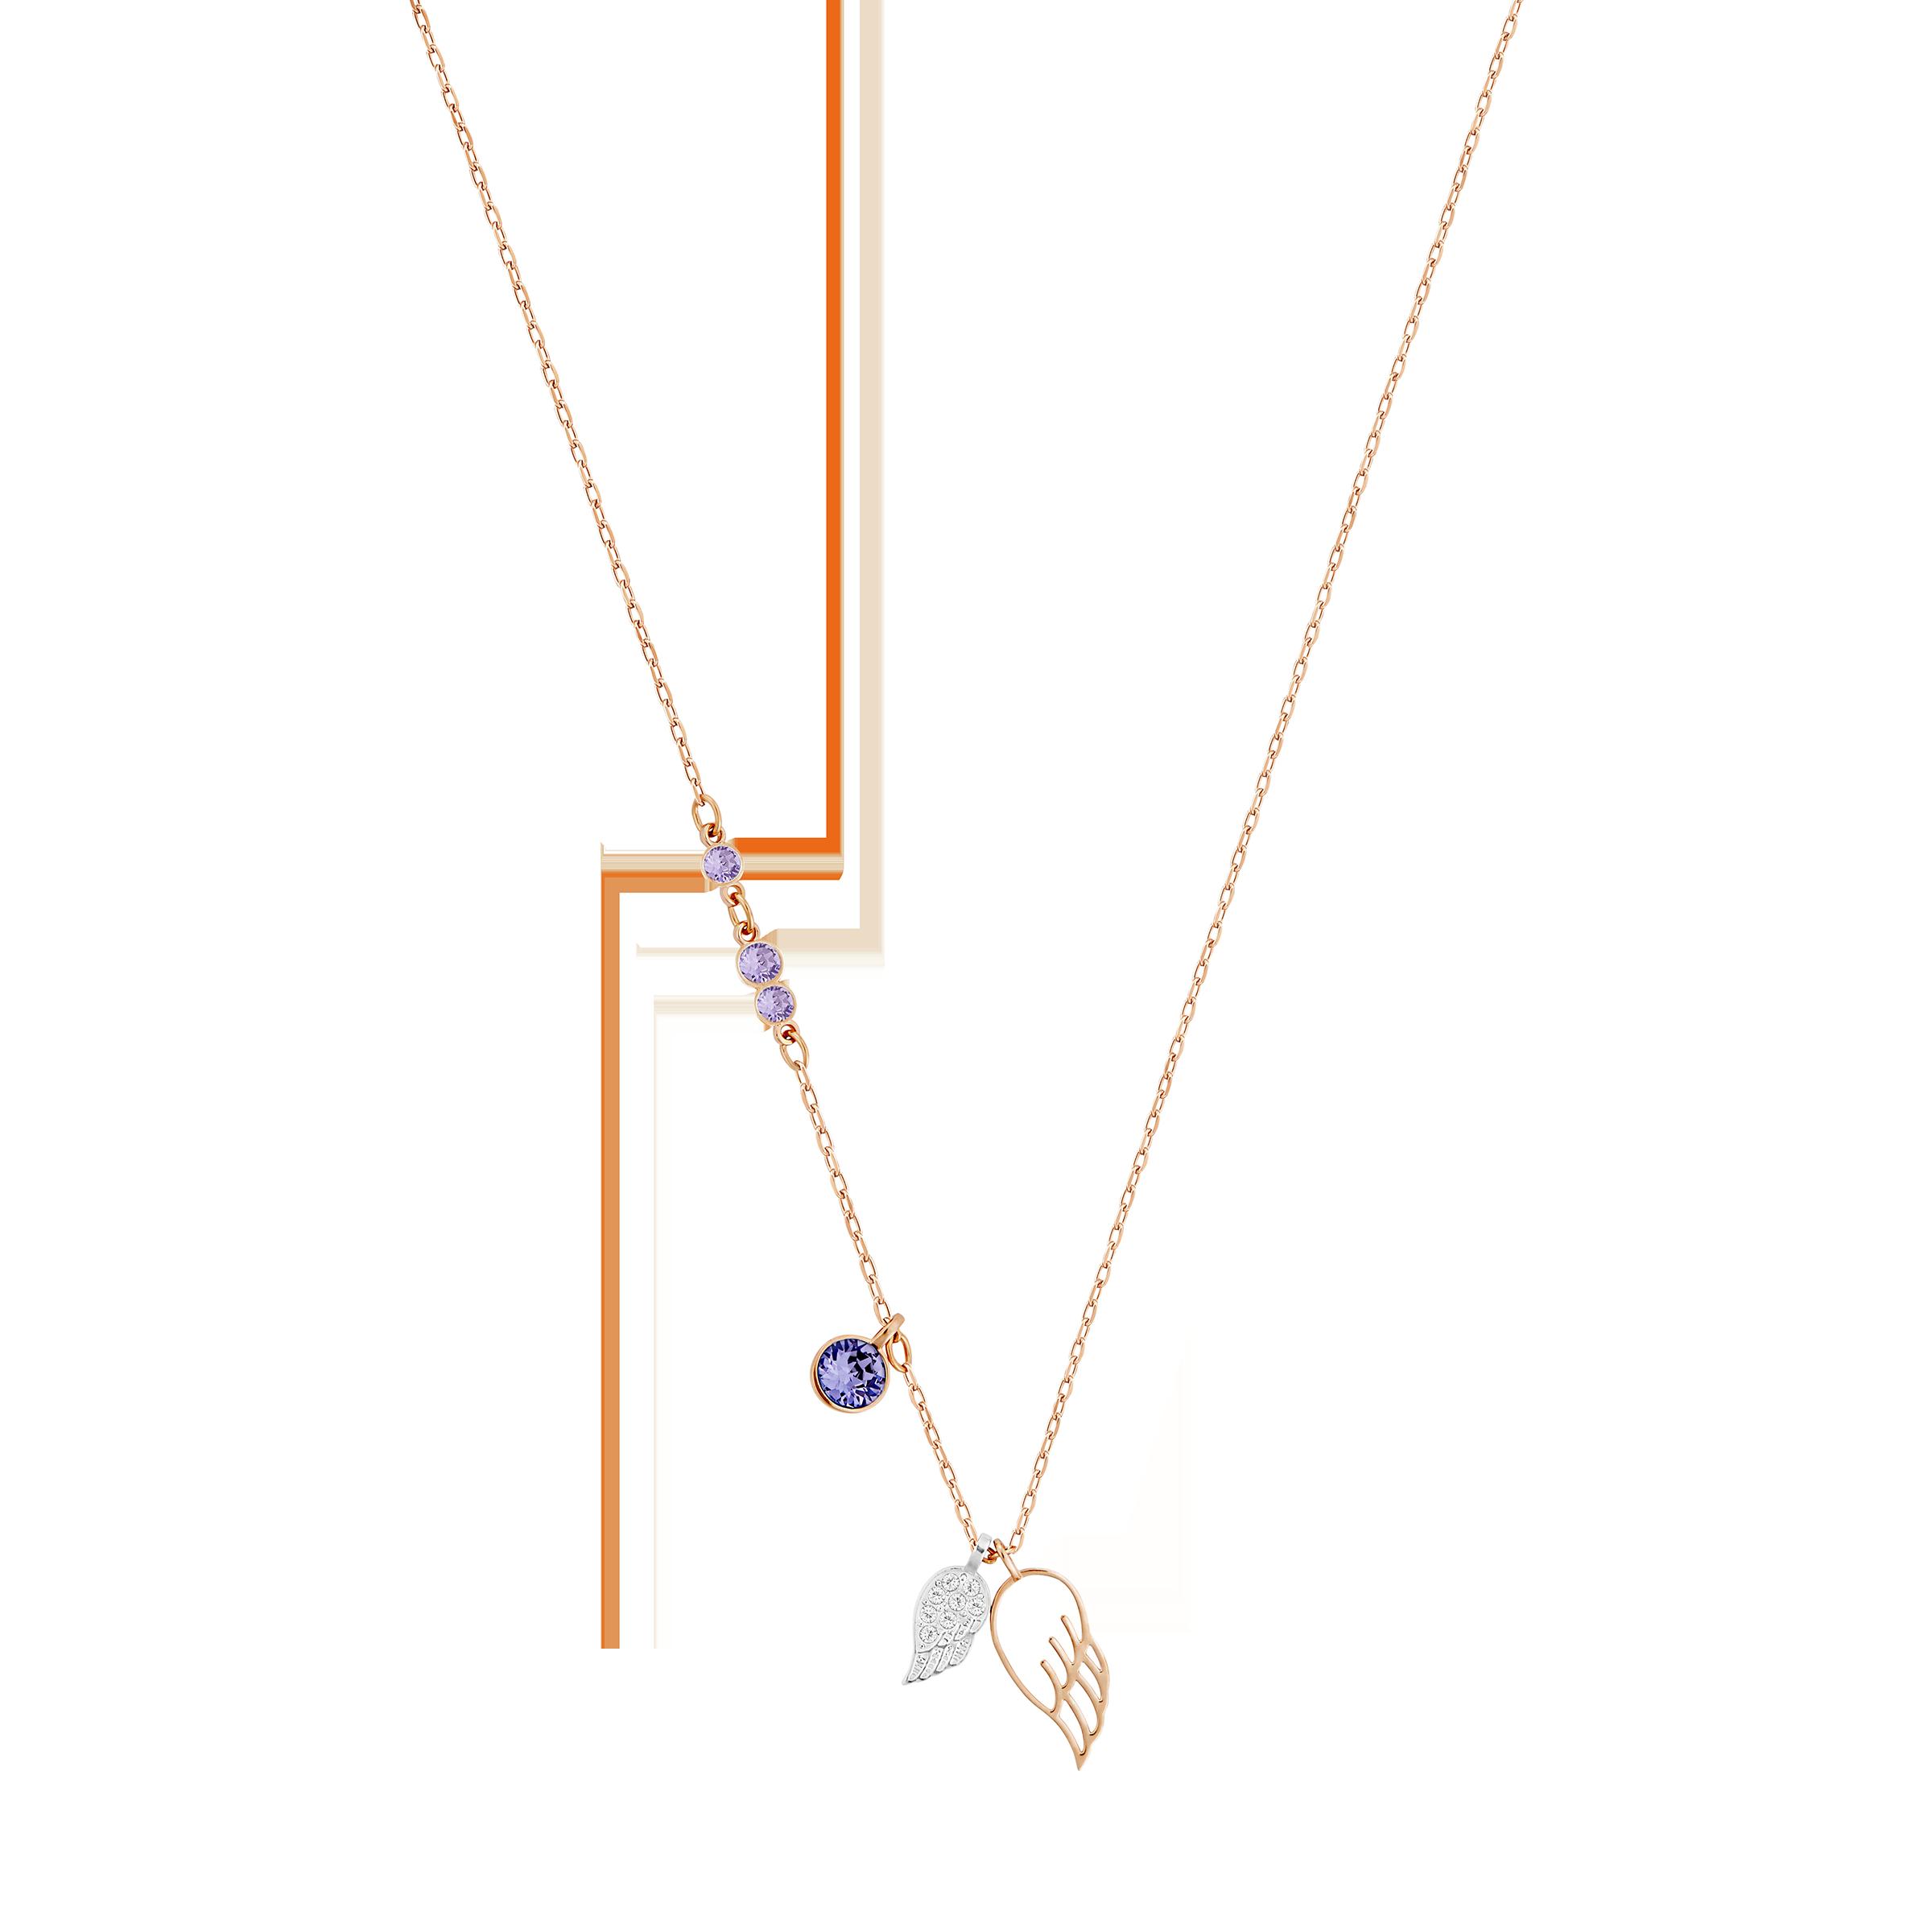 Swarovski Symbolic Wing Pendant, Violet, Mixed metal finish